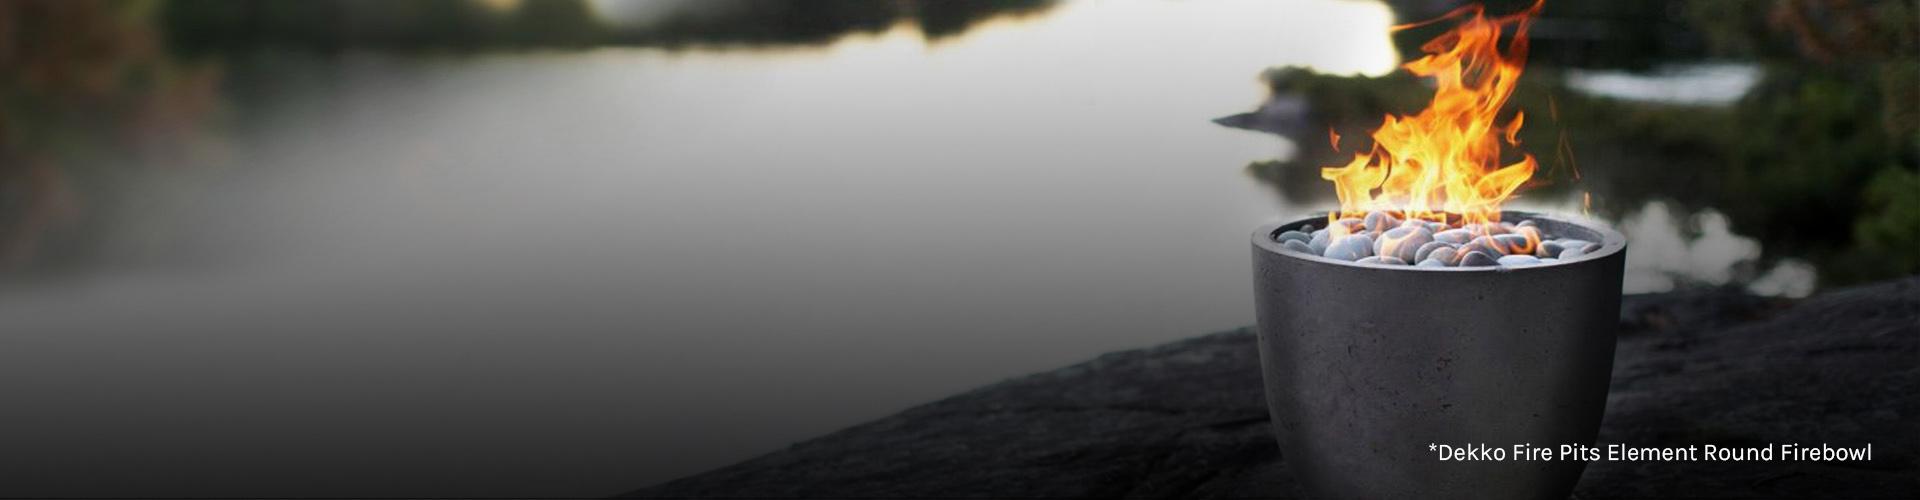 Dekko Fire Pits Element Round Firebowl